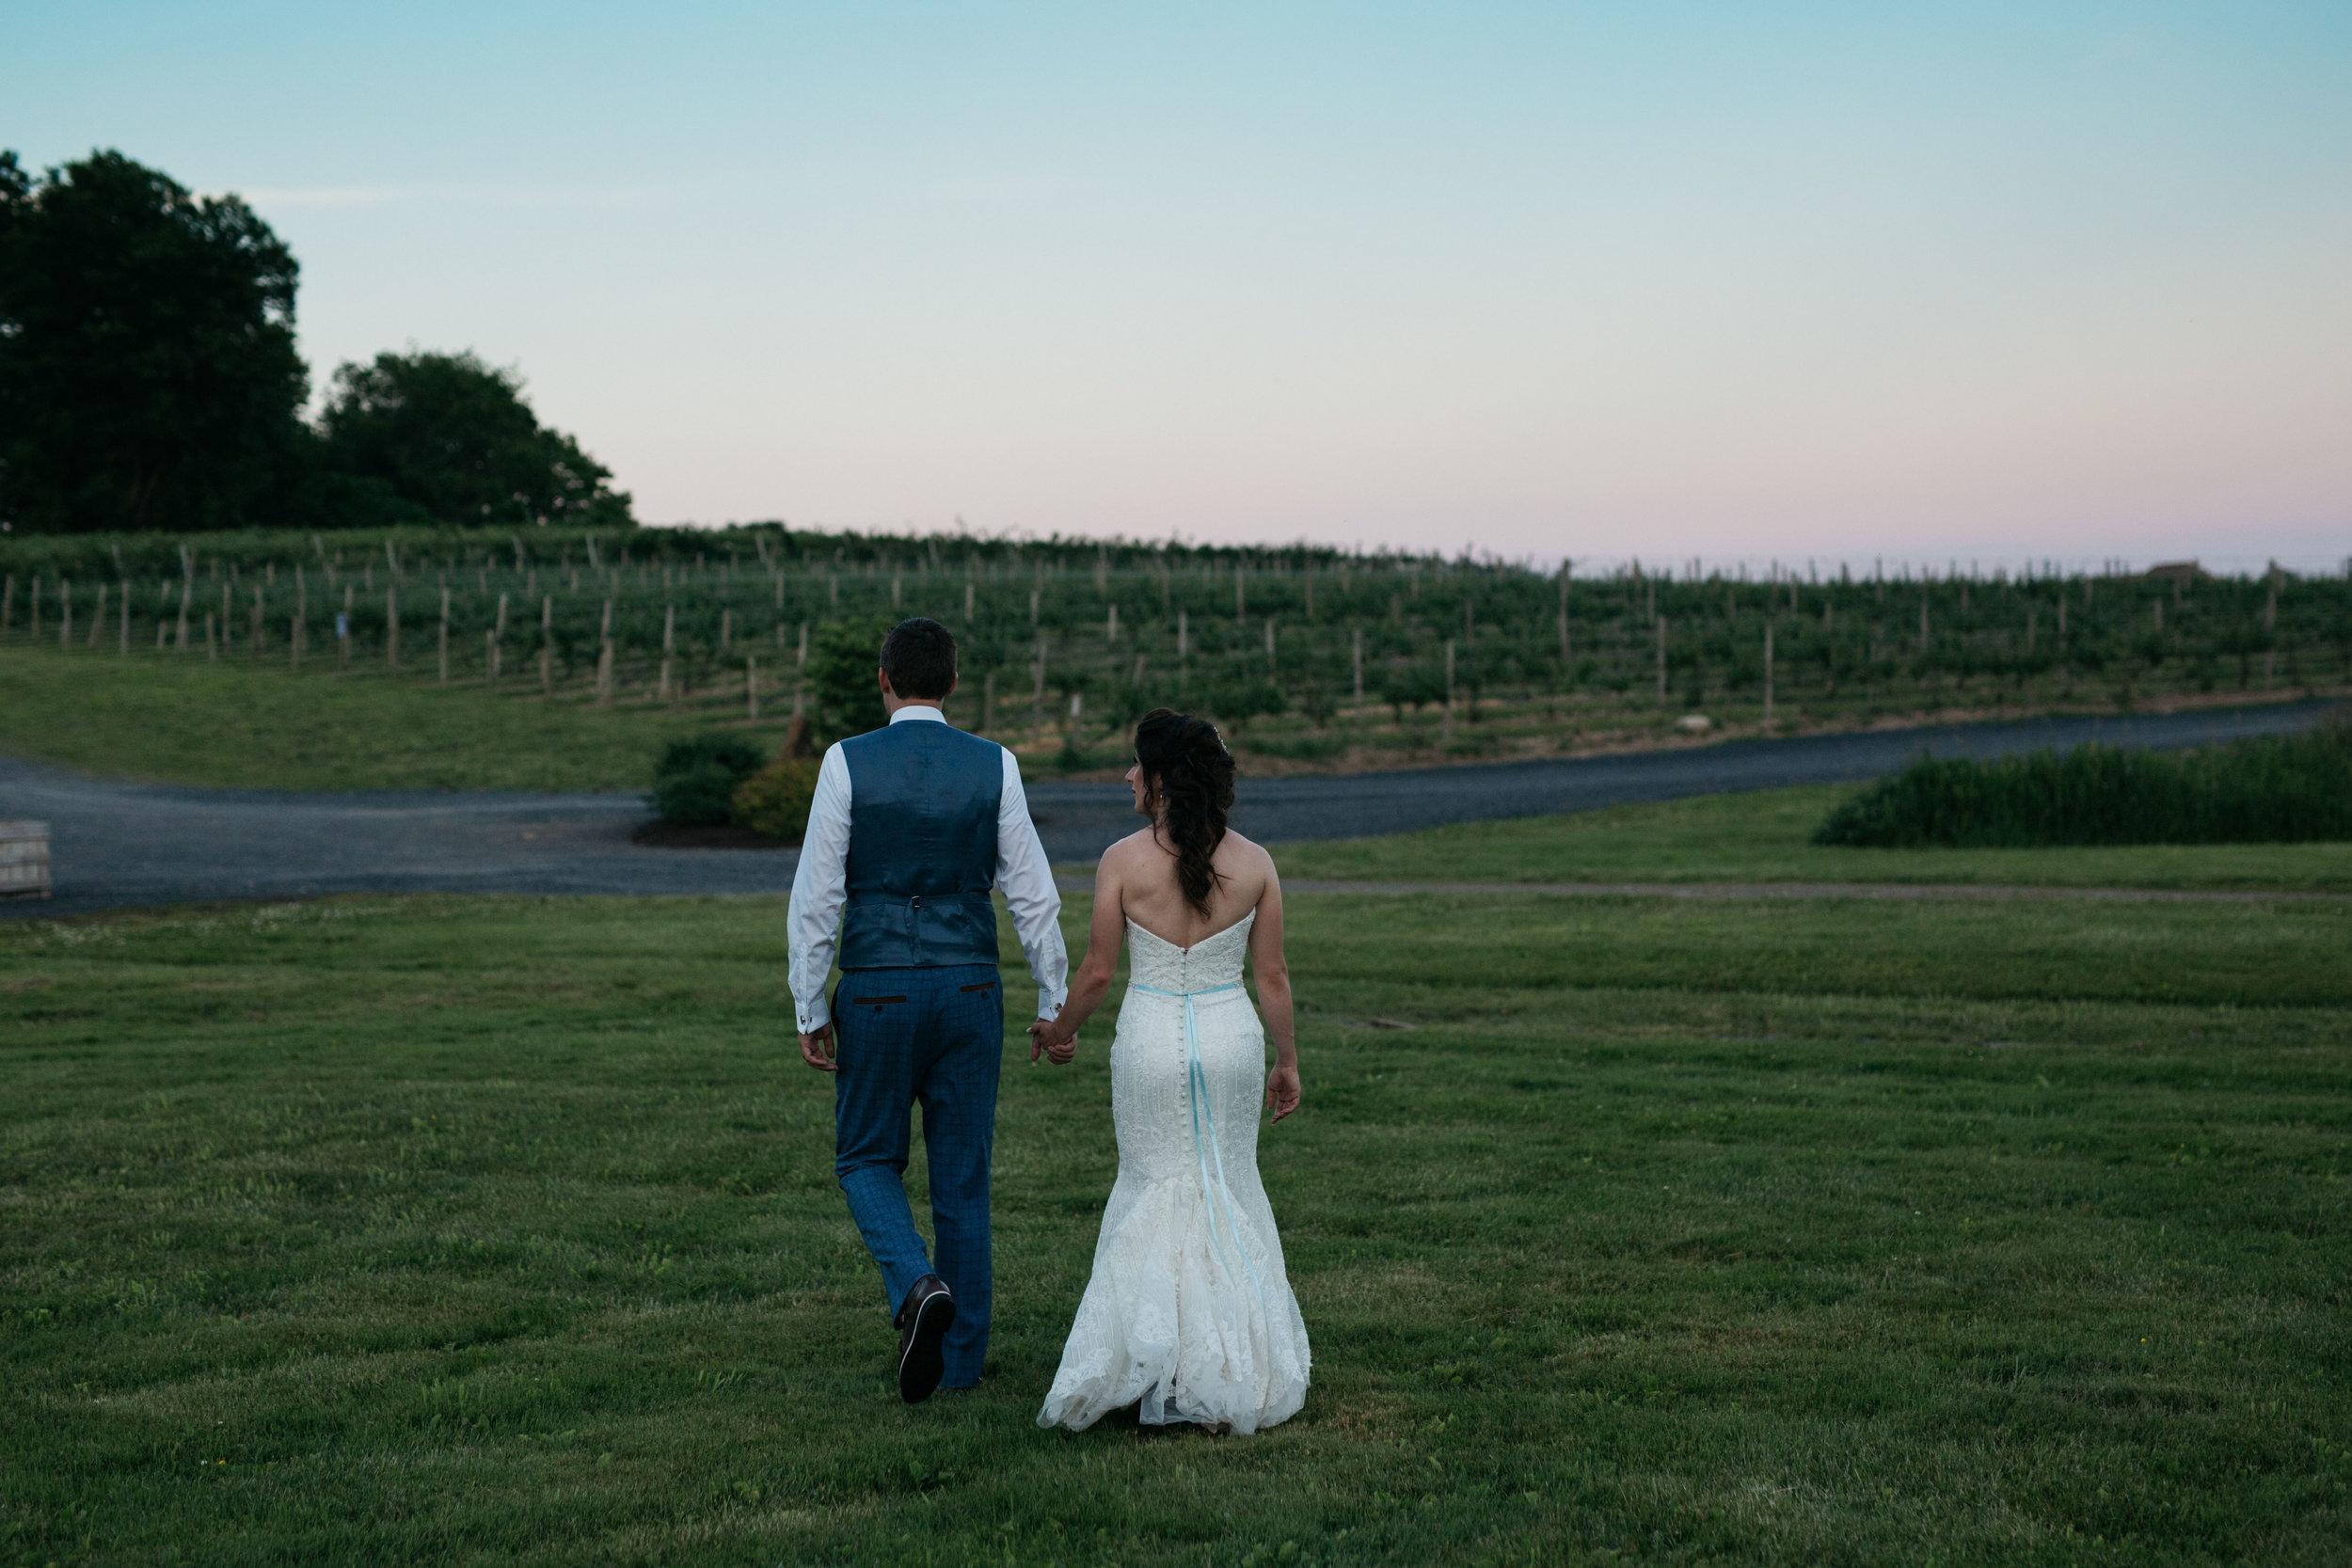 nostrano_vineyards_wedding_0087.JPG